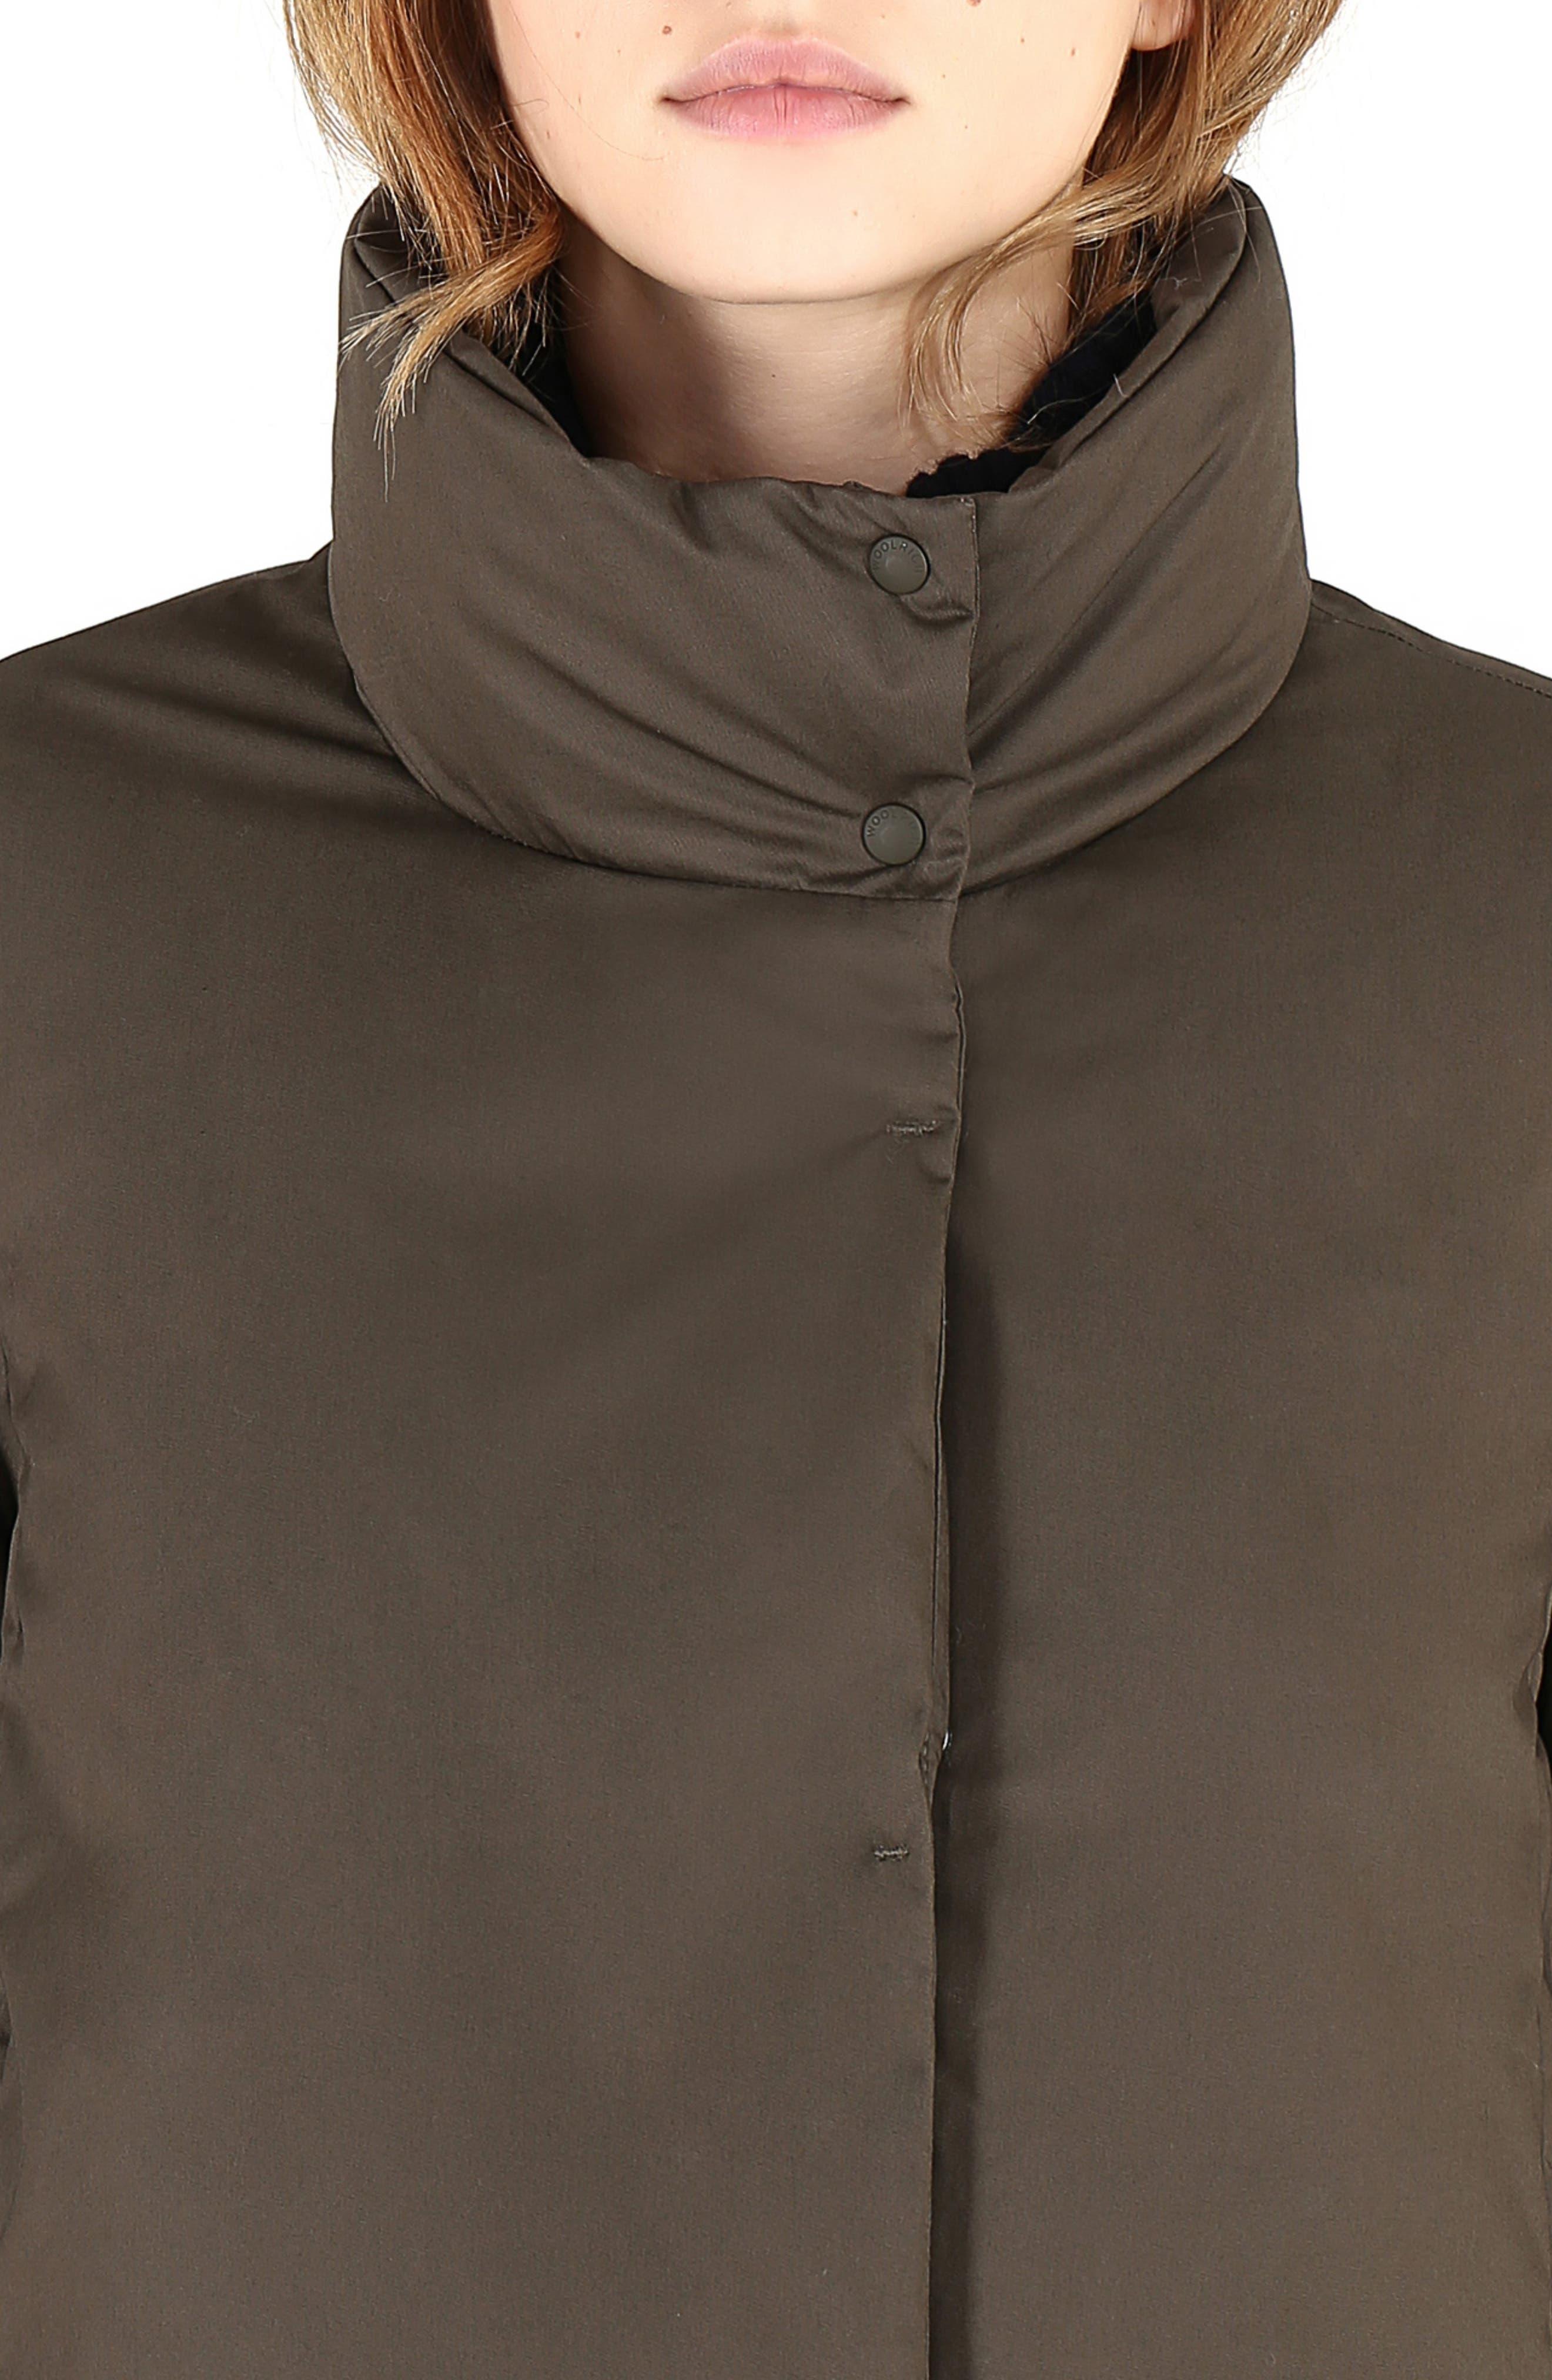 Cocoon Genuine Shearling Trim Down Coat,                             Alternate thumbnail 6, color,                             311